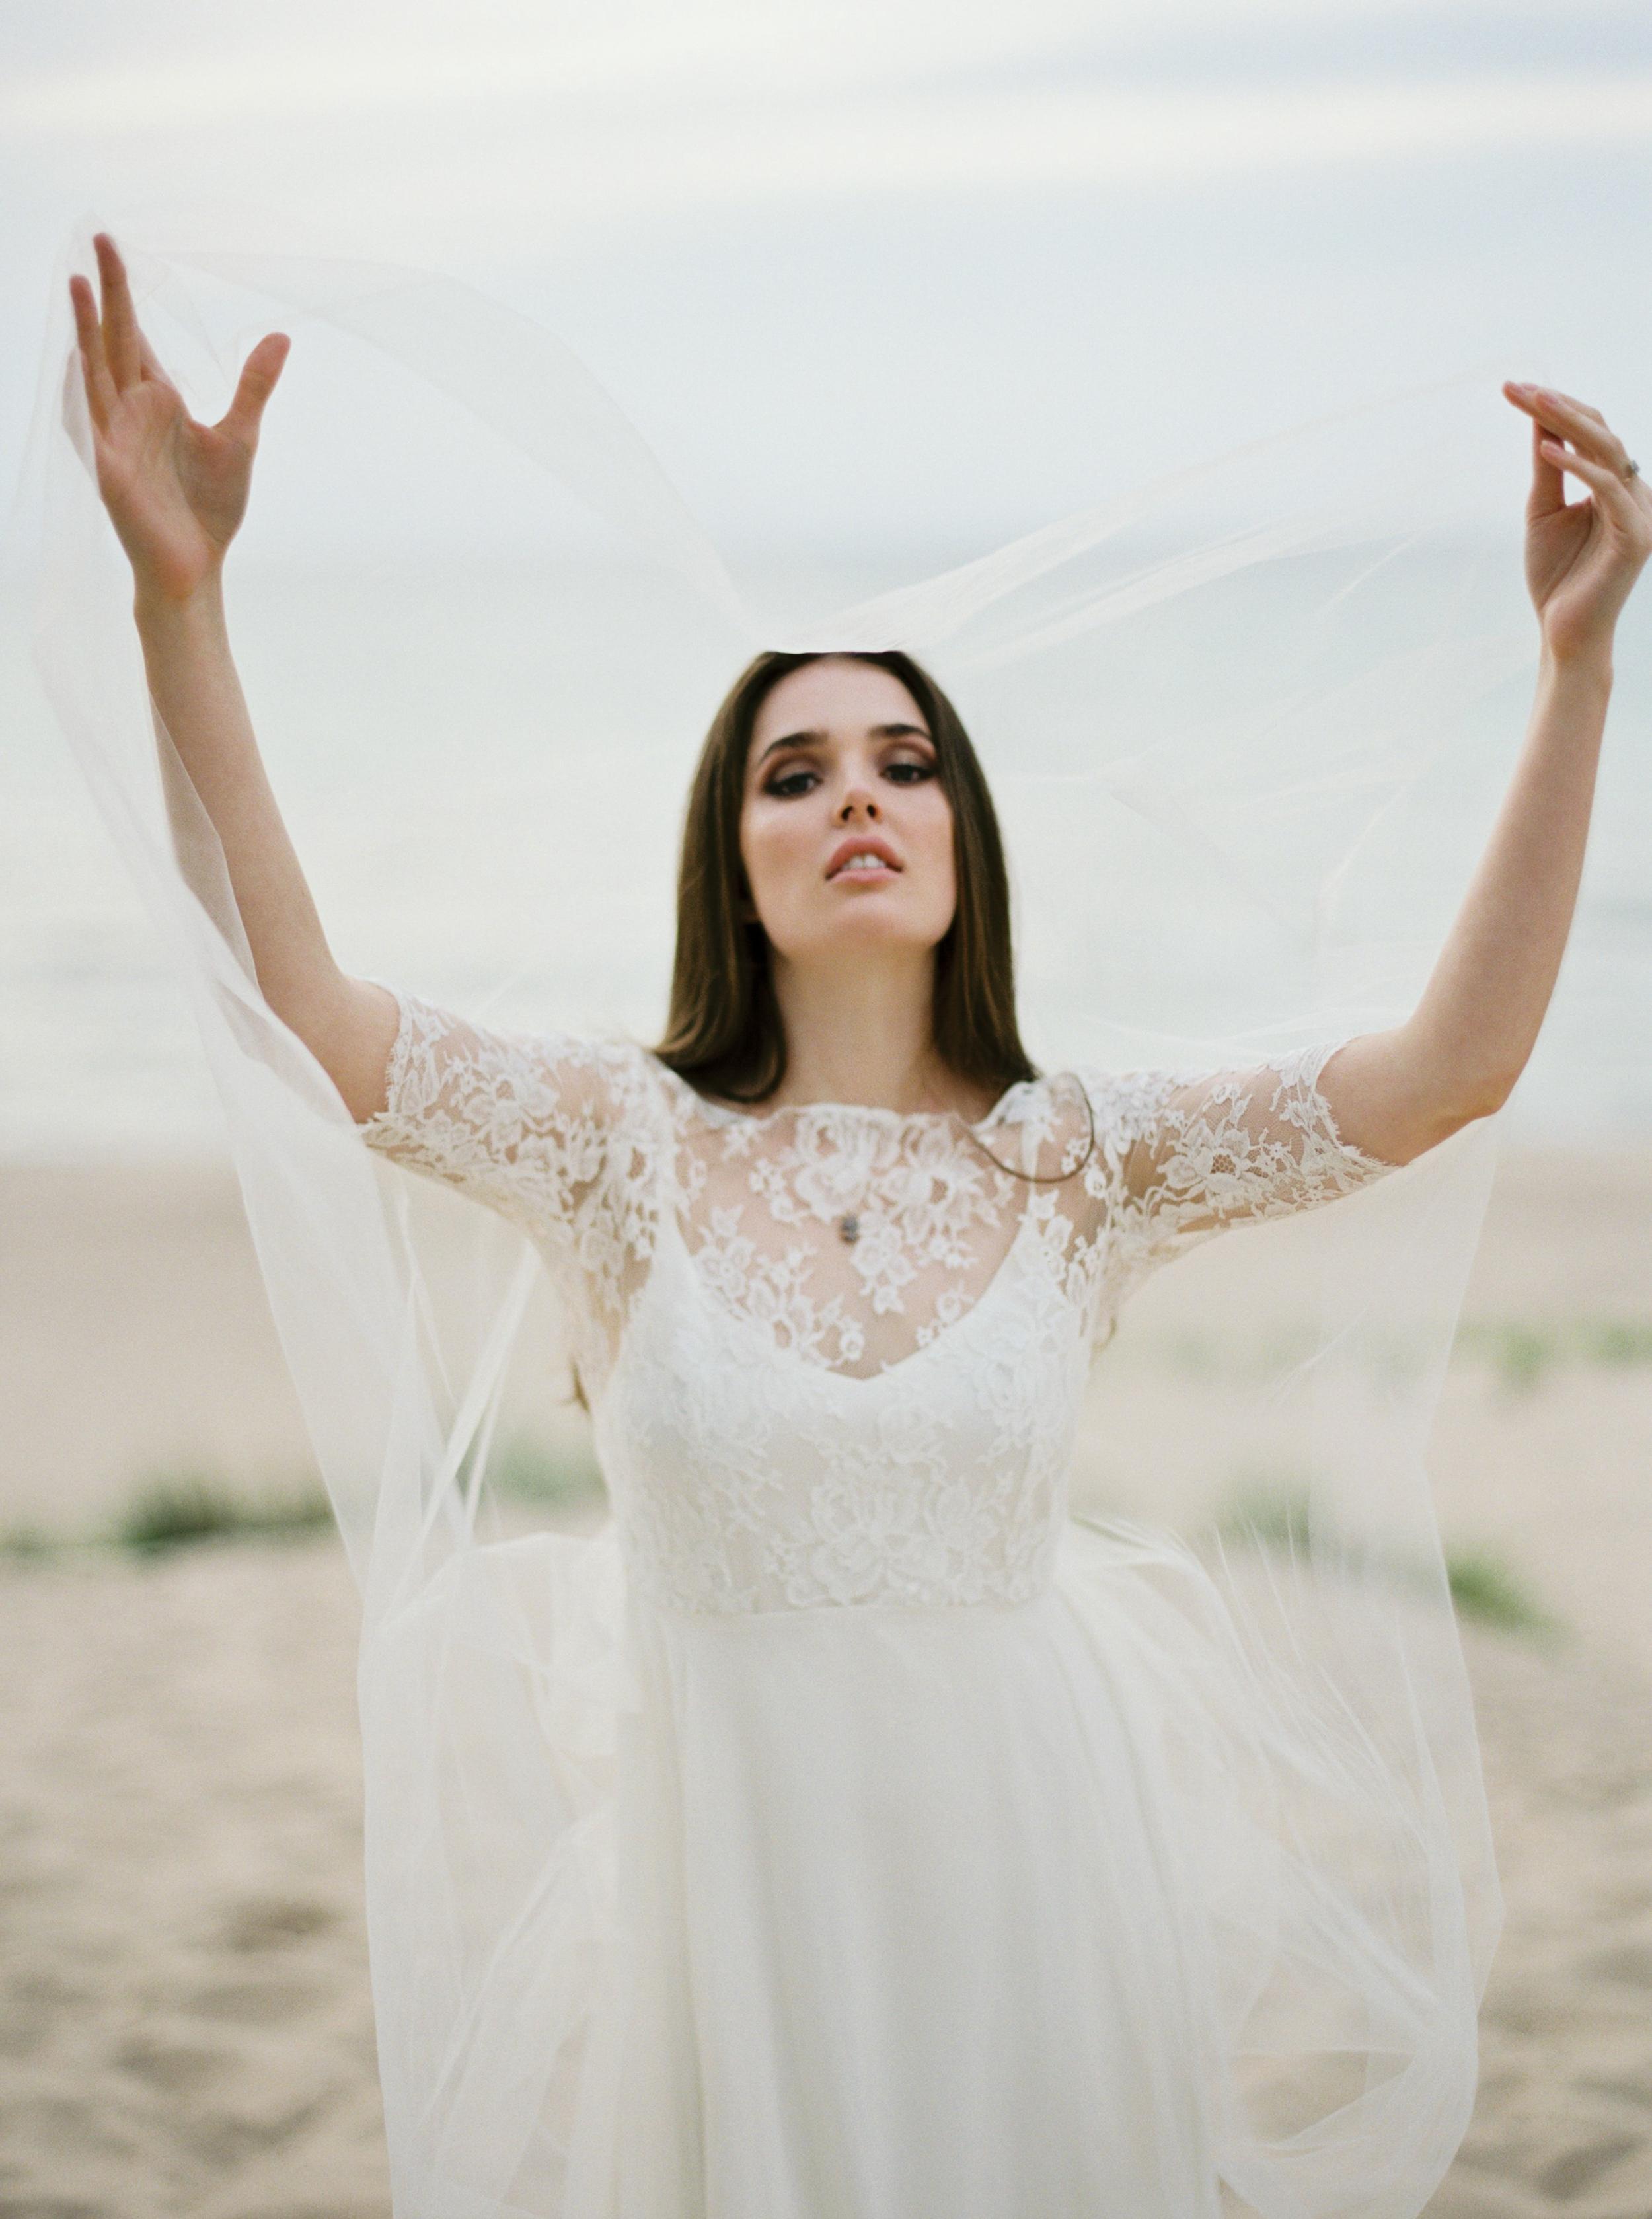 Kyle John l Fine Art Wedding Photography l Chicago, Copenhagen, California, New York, Destination l Blog l Jessica W_17